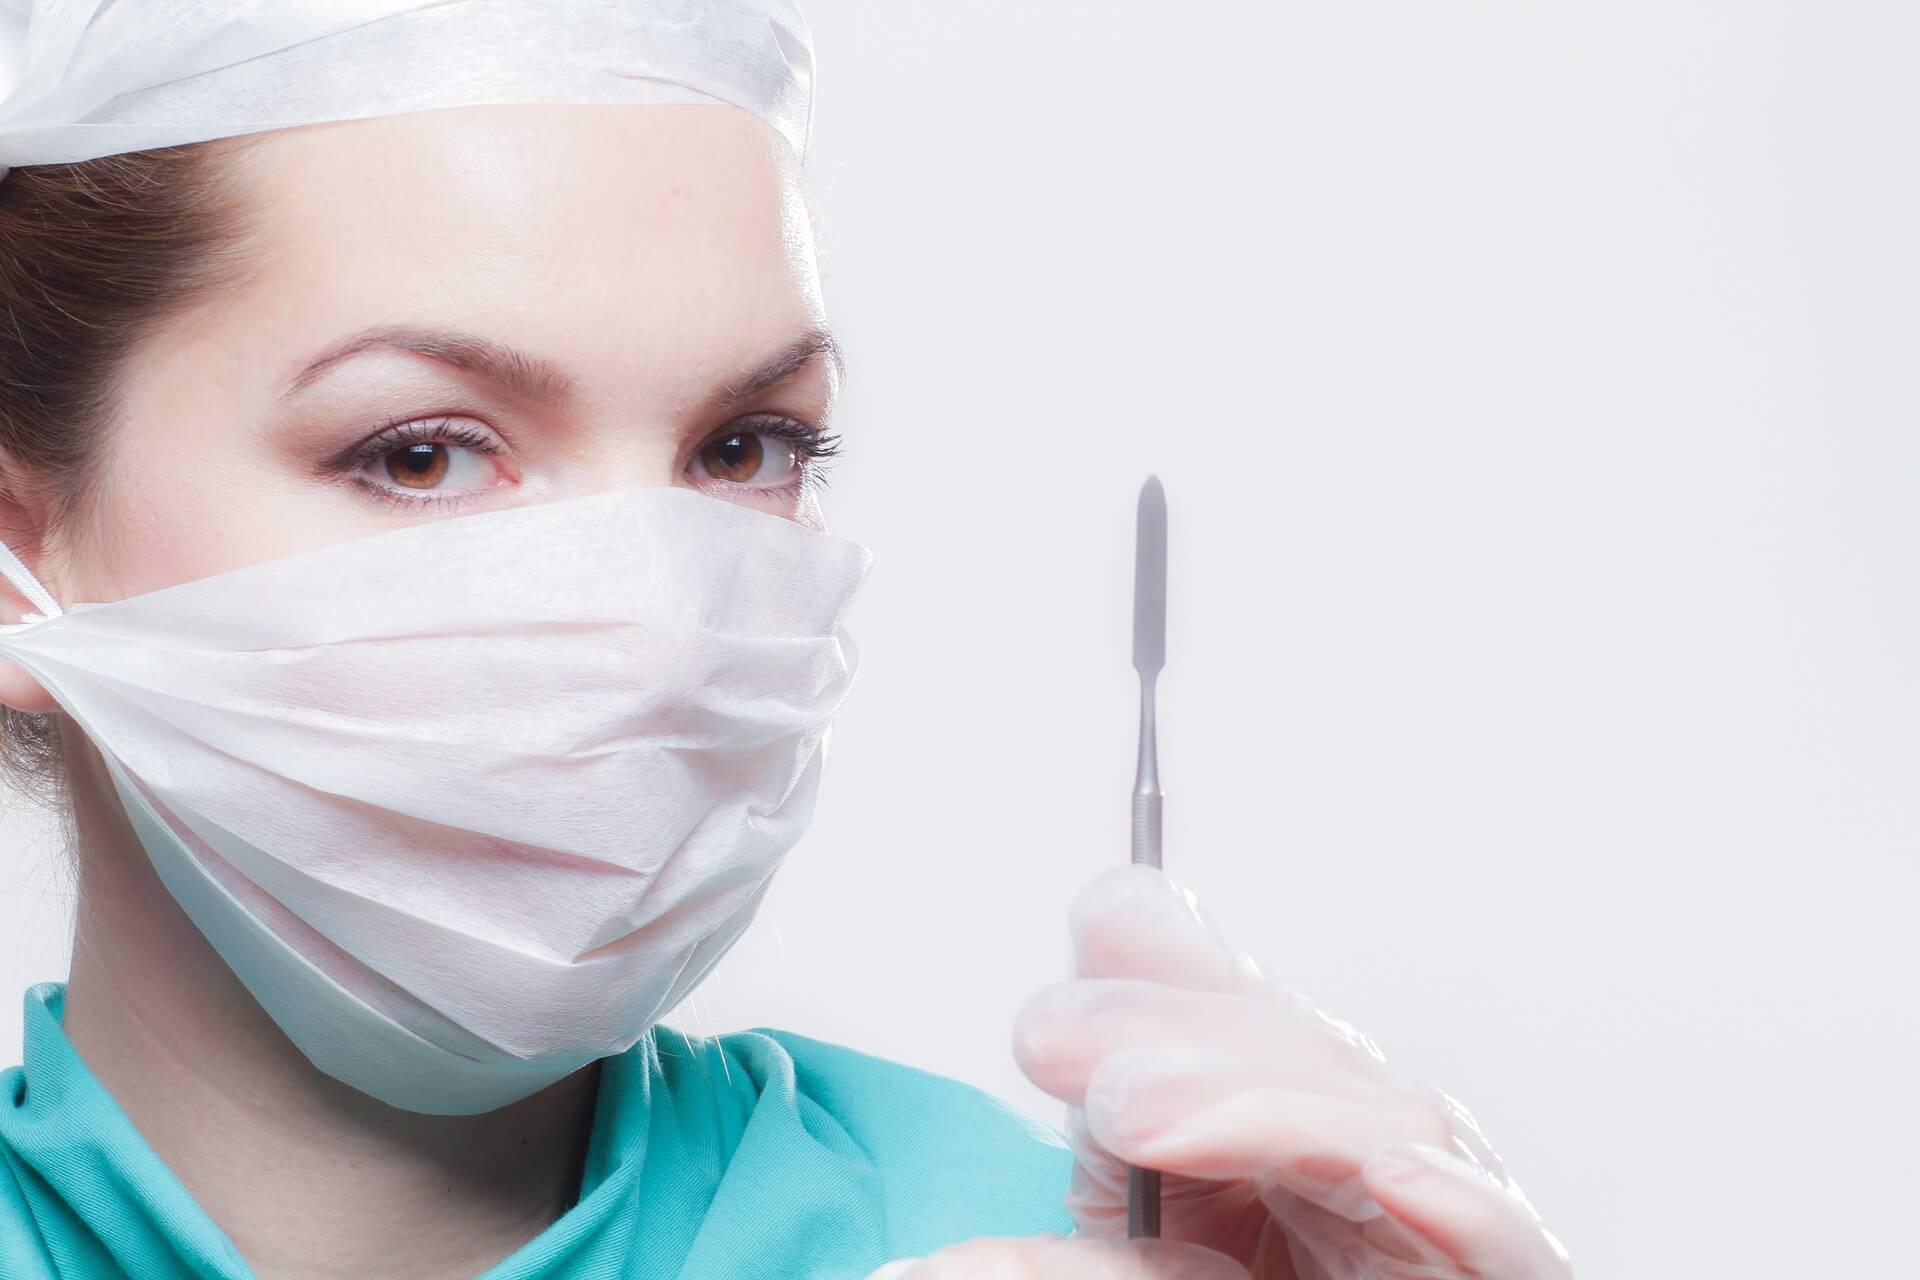 Herpes, Tubal Obstruction, Vaginal Infection, Vaginal lubricant, Infection, Pelvic, Infection of Pelvic, ERT, HRT